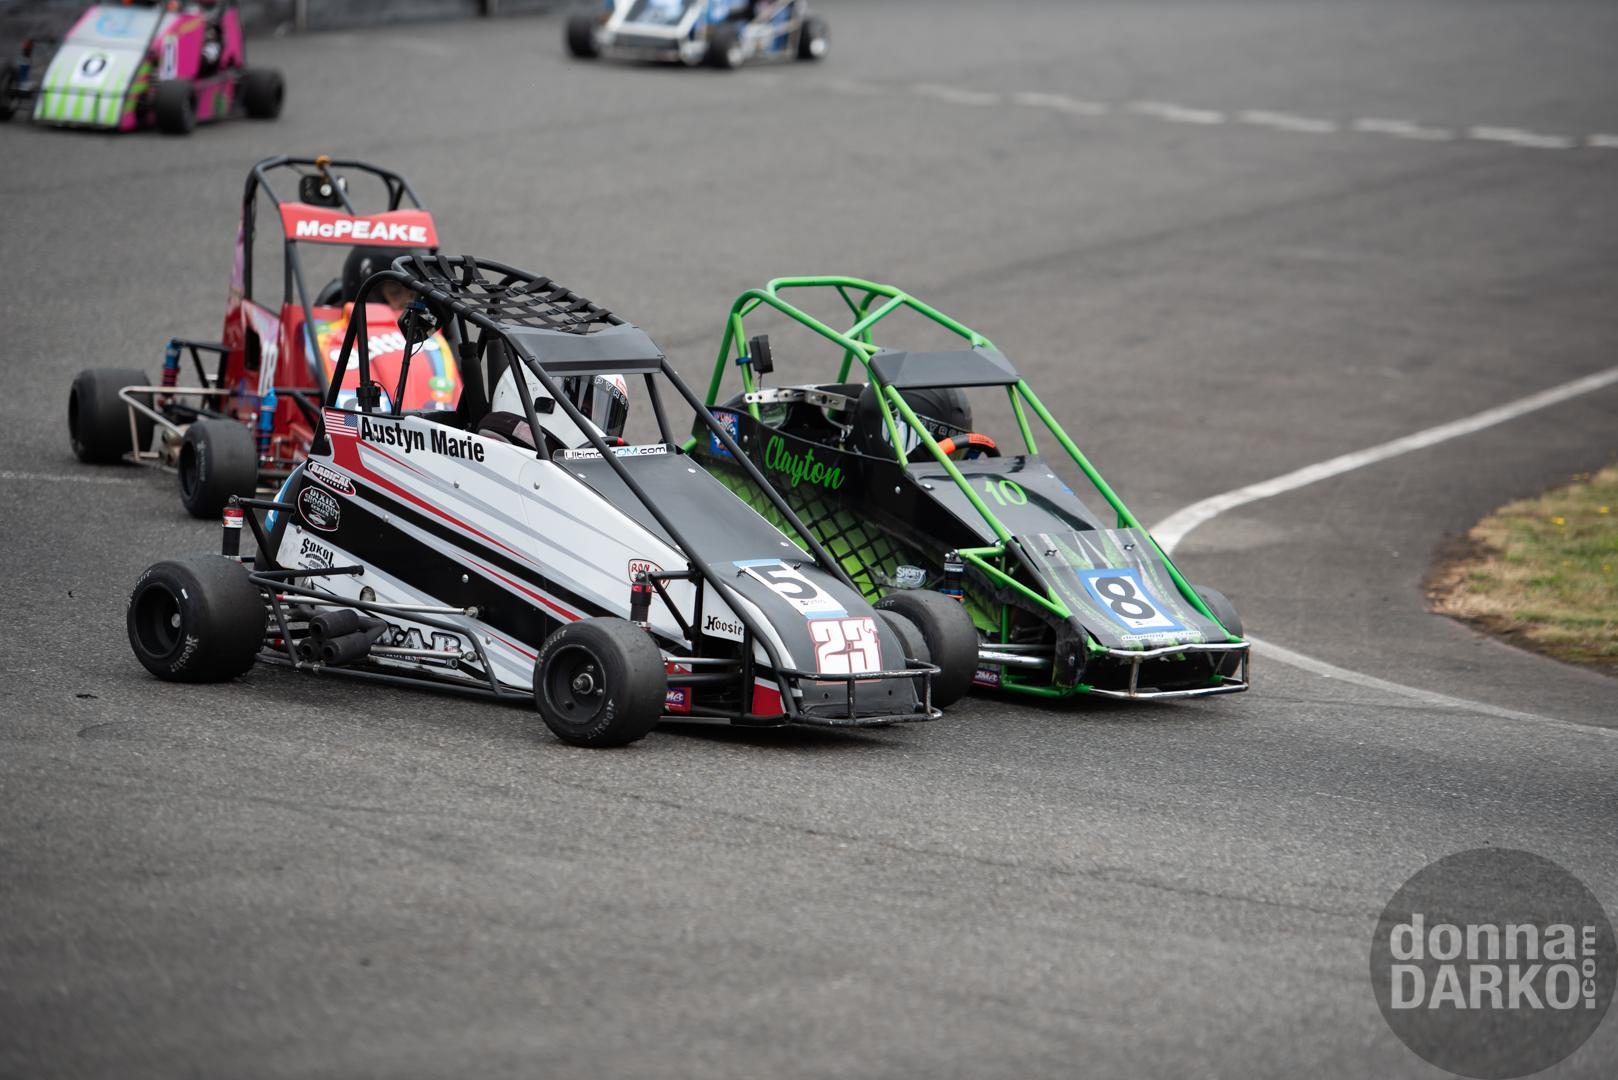 QWMA (Racing) 8-11-2019 DSC_6925.jpg